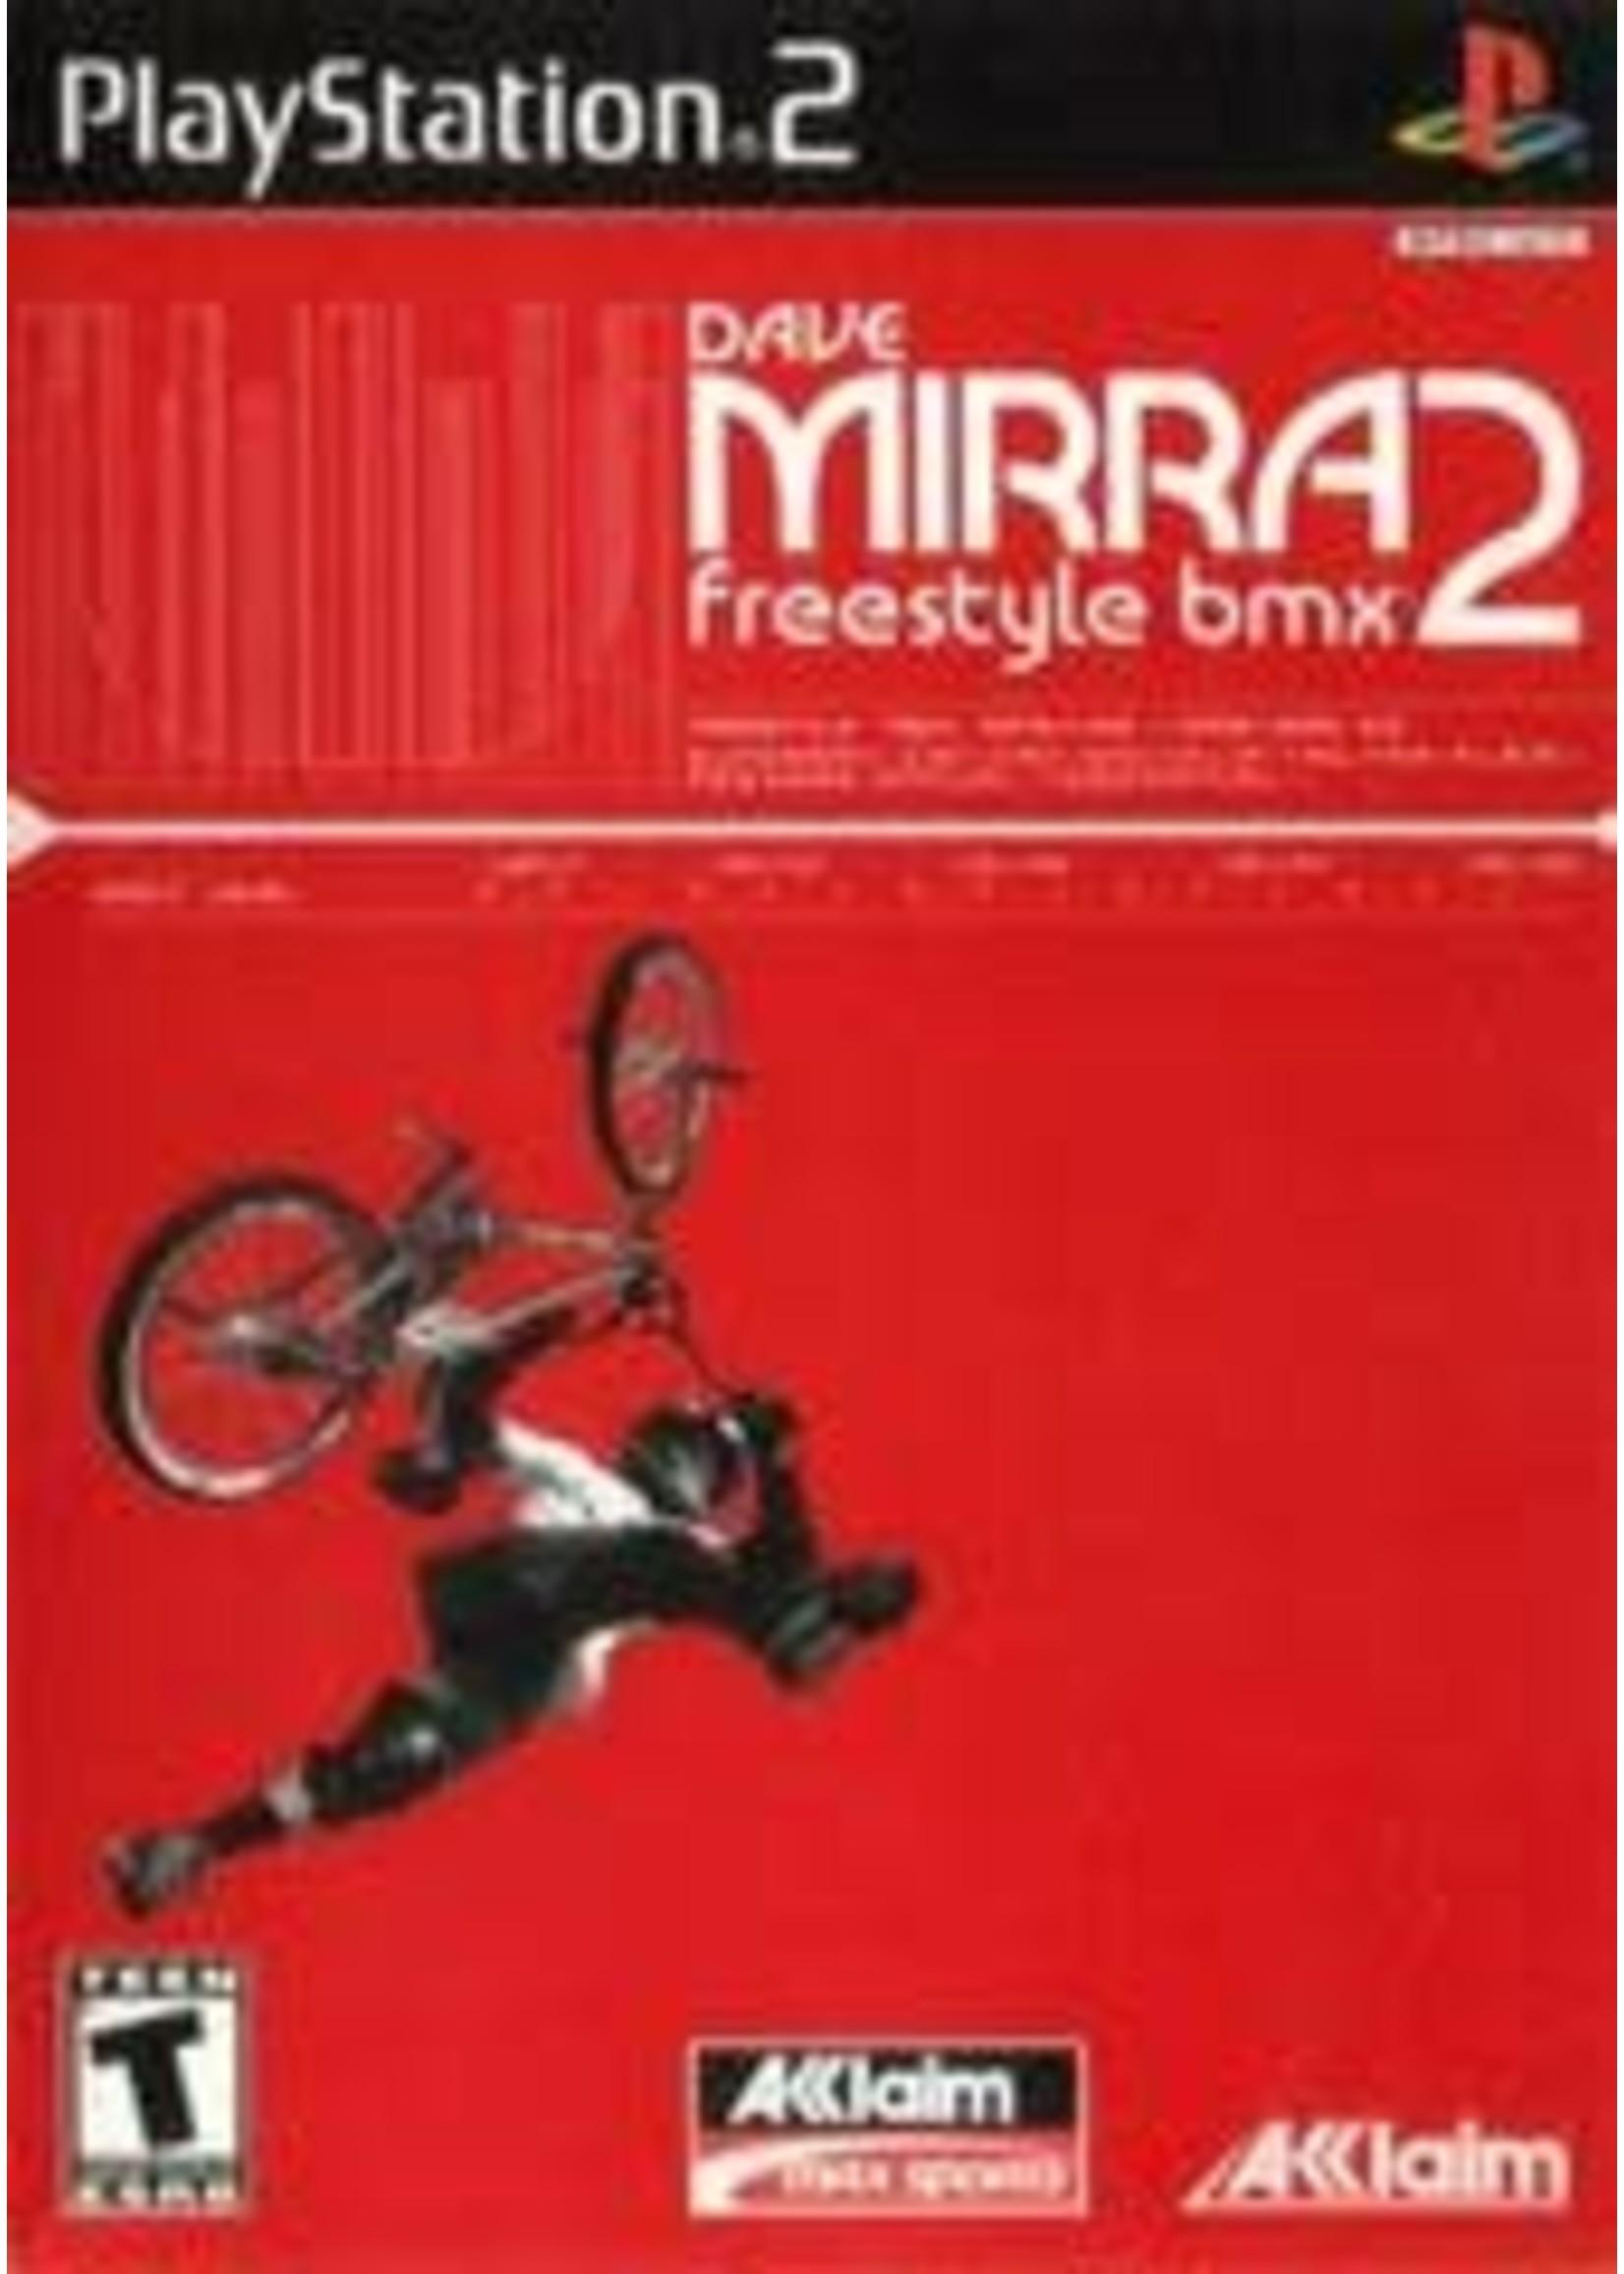 Dave Mirra Freestyle BMX 2 Playstation 2